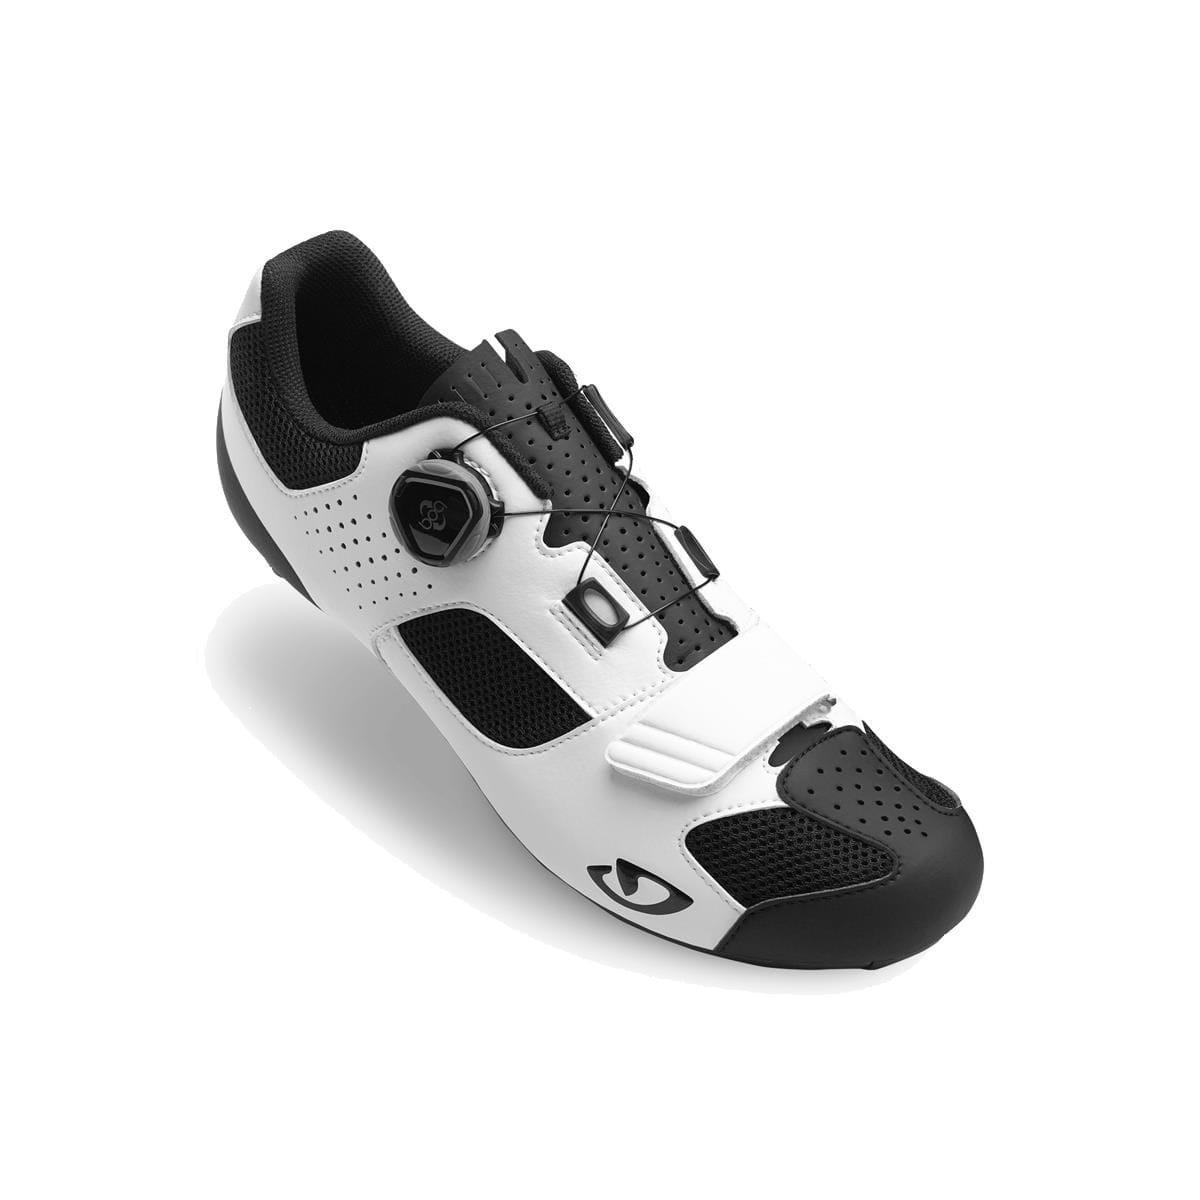 Trans (BOA) Road Cycling Shoes